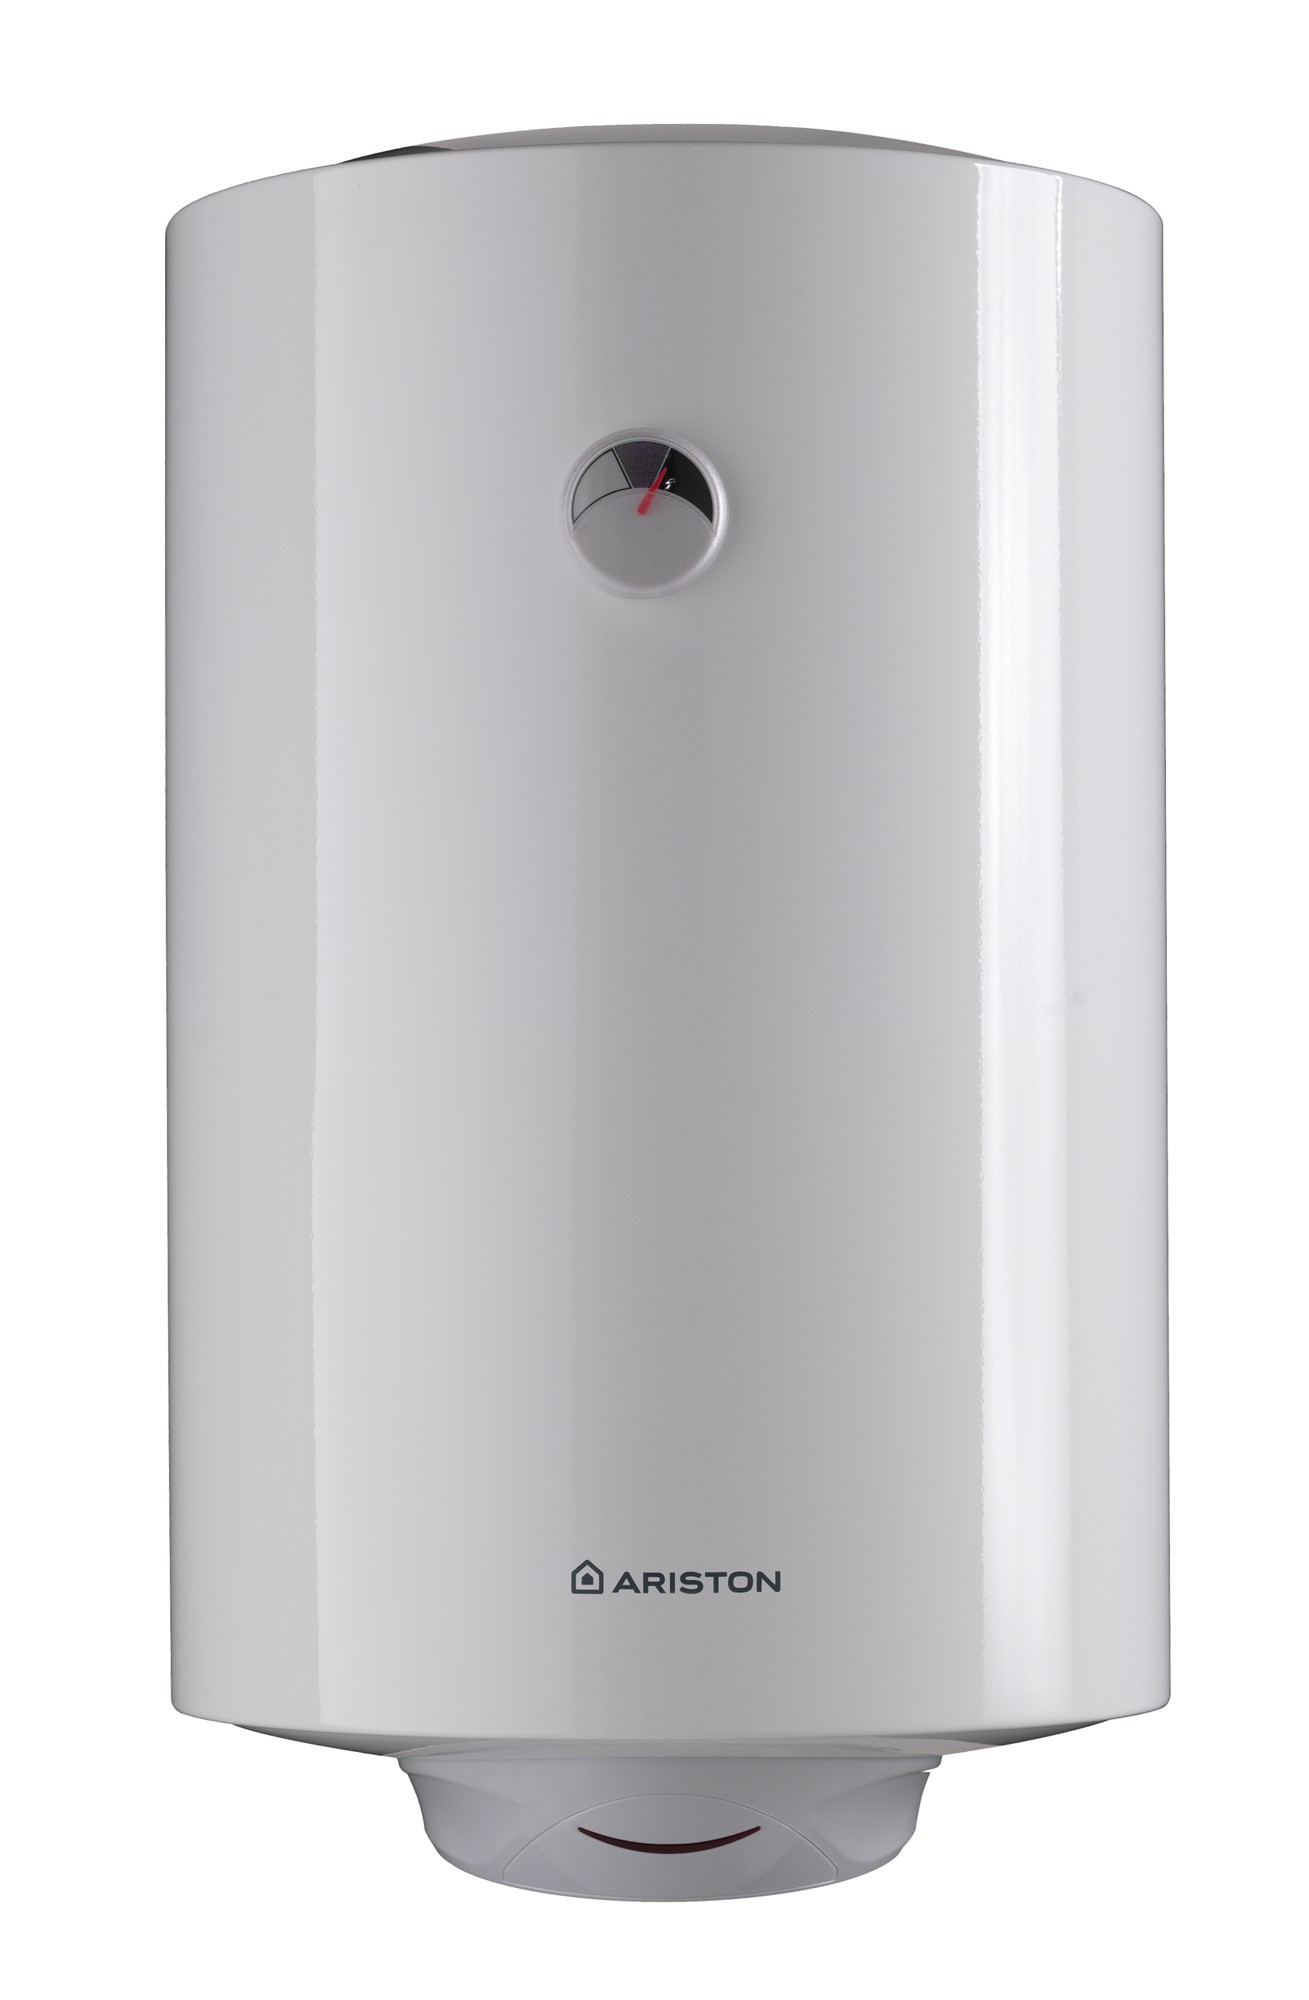 Mobila pentru bucataria boiler ariston instructiuni de - Montare scaldabagno elettrico ...